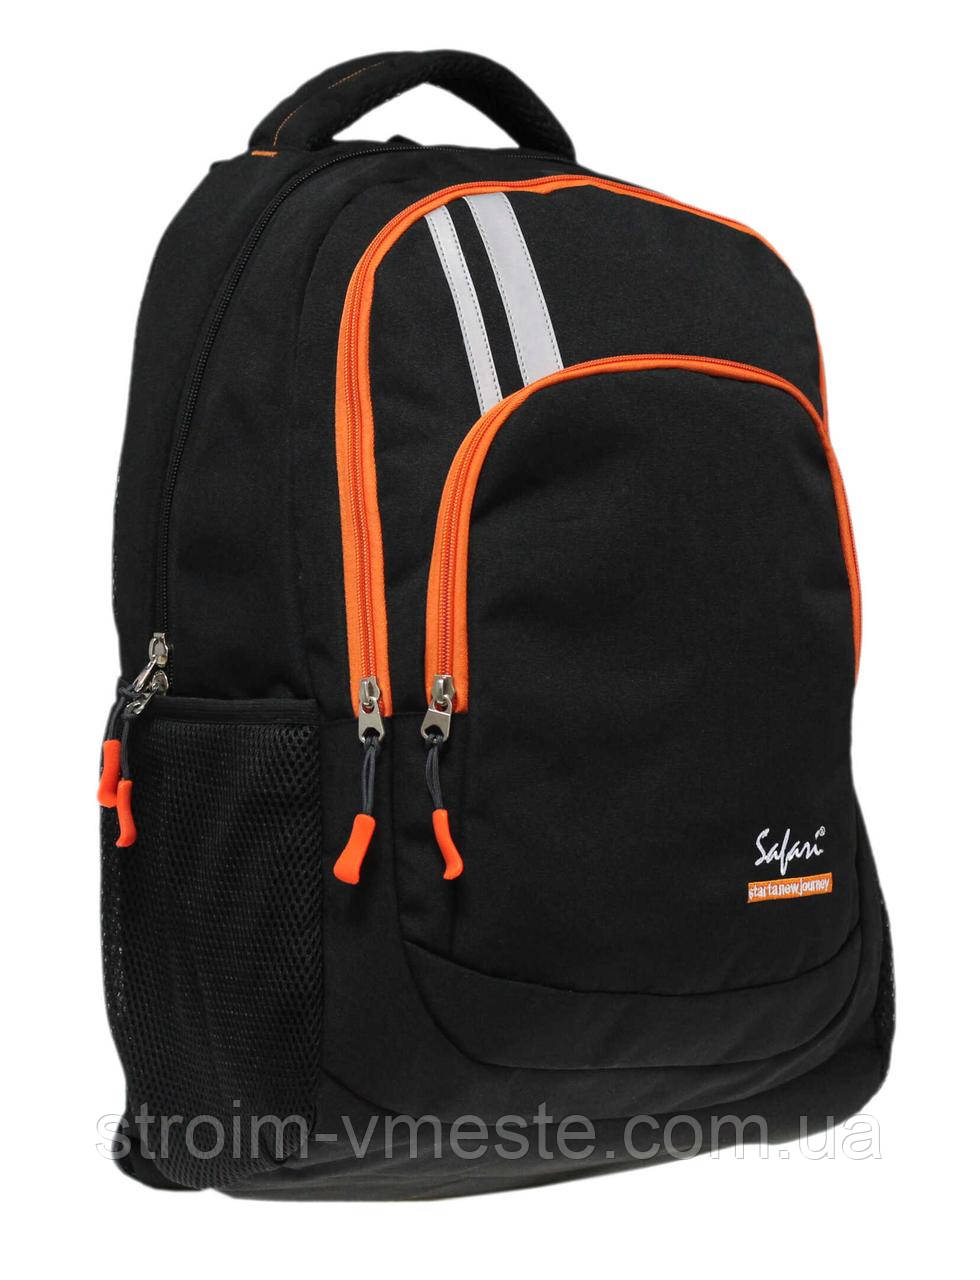 Рюкзак, 2 отделения, 49*31*18см, PL, Safari Sport, 19-139L-2, SAFARI